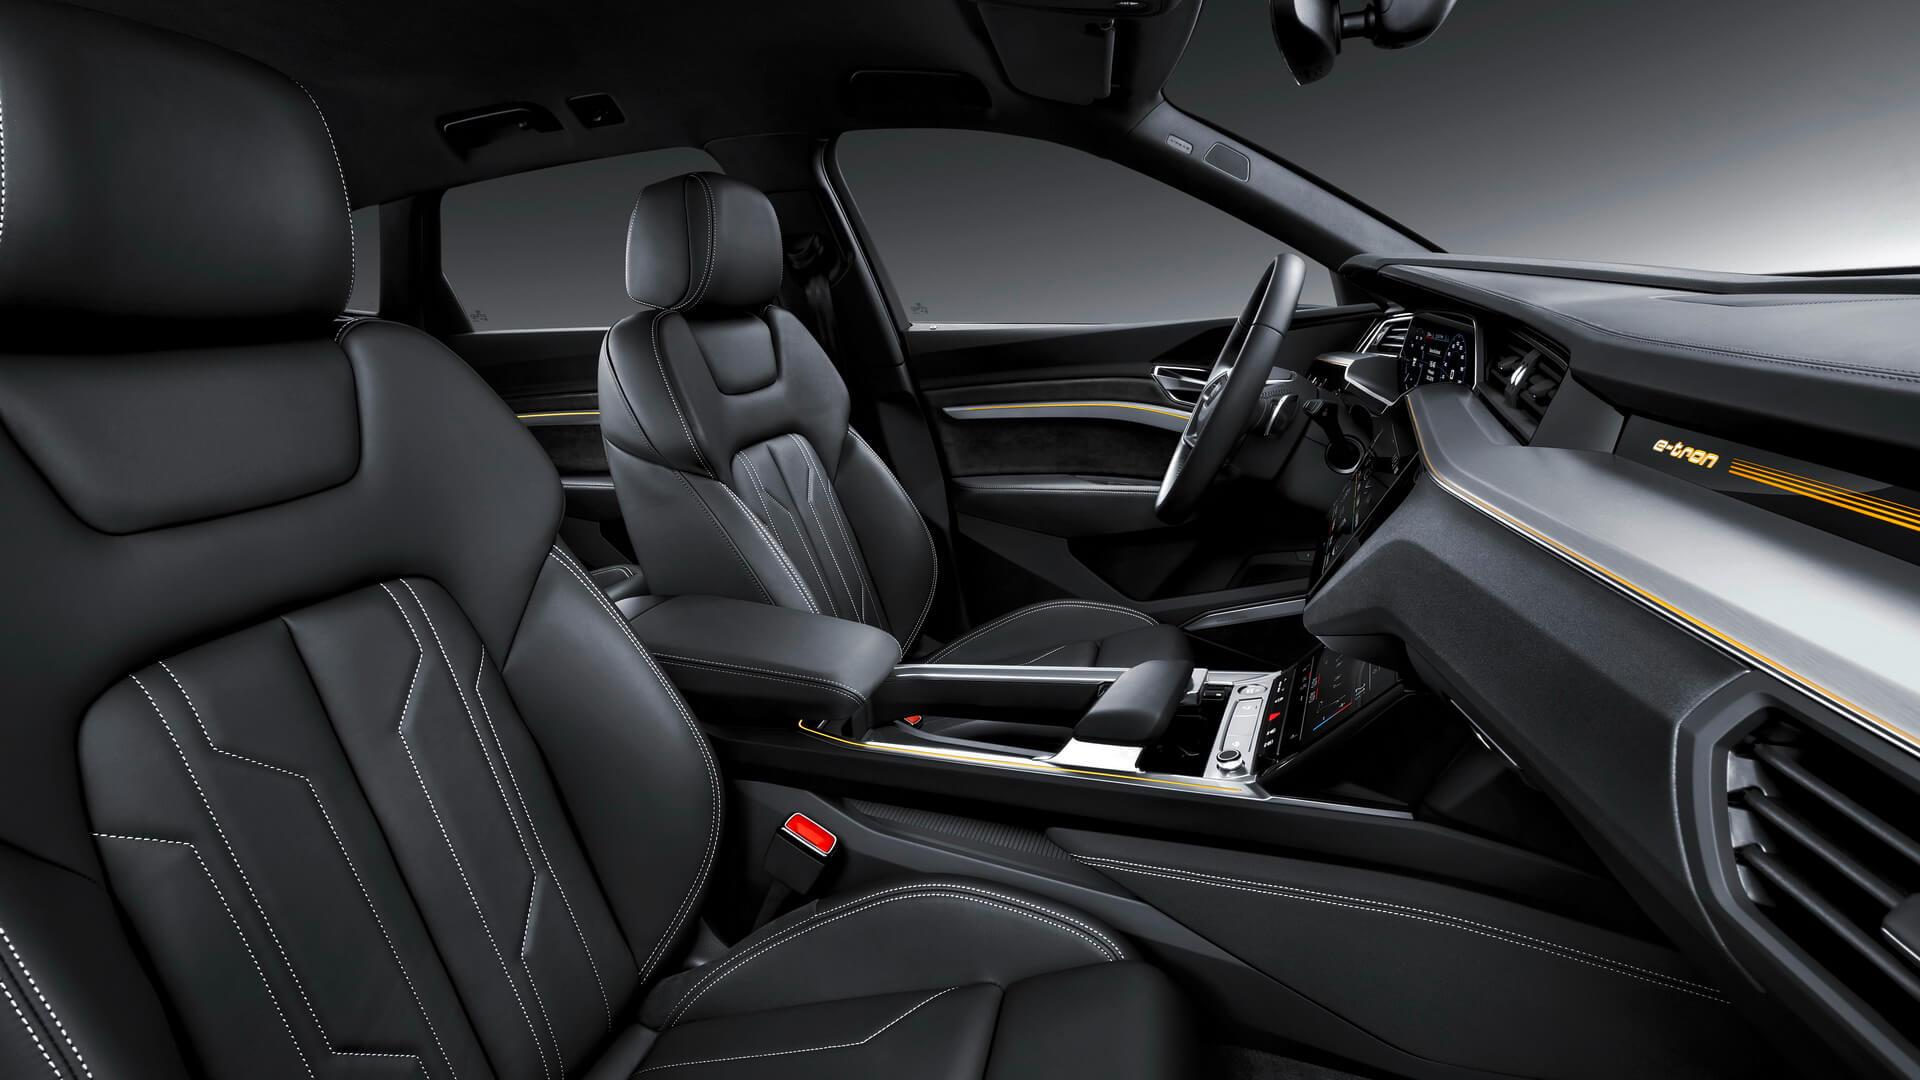 Фотография экоавто Audi e-tron 55 quattro - фото 24